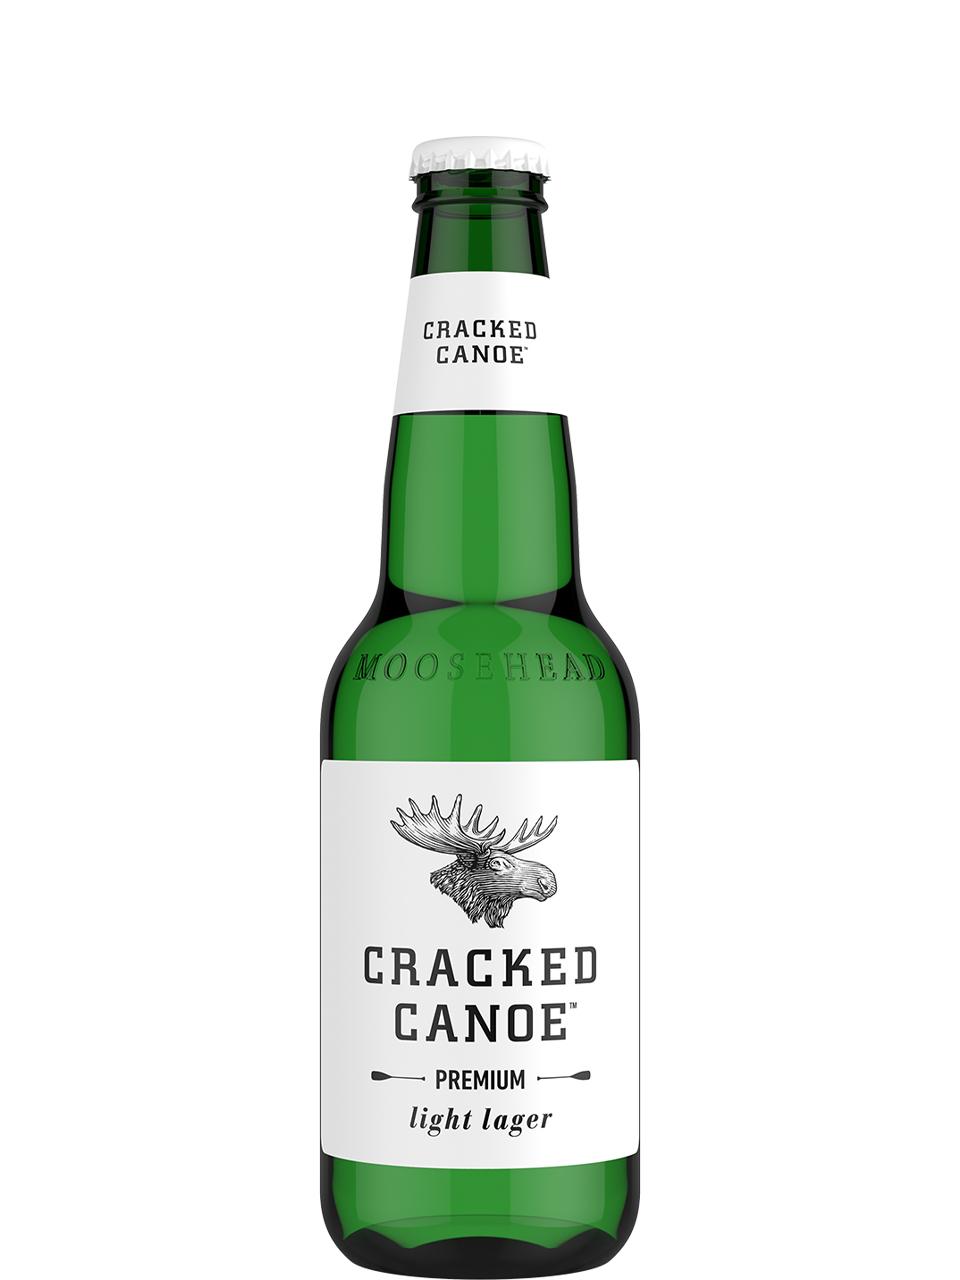 Moosehead Cracked Canoe 12 Pack Bottles